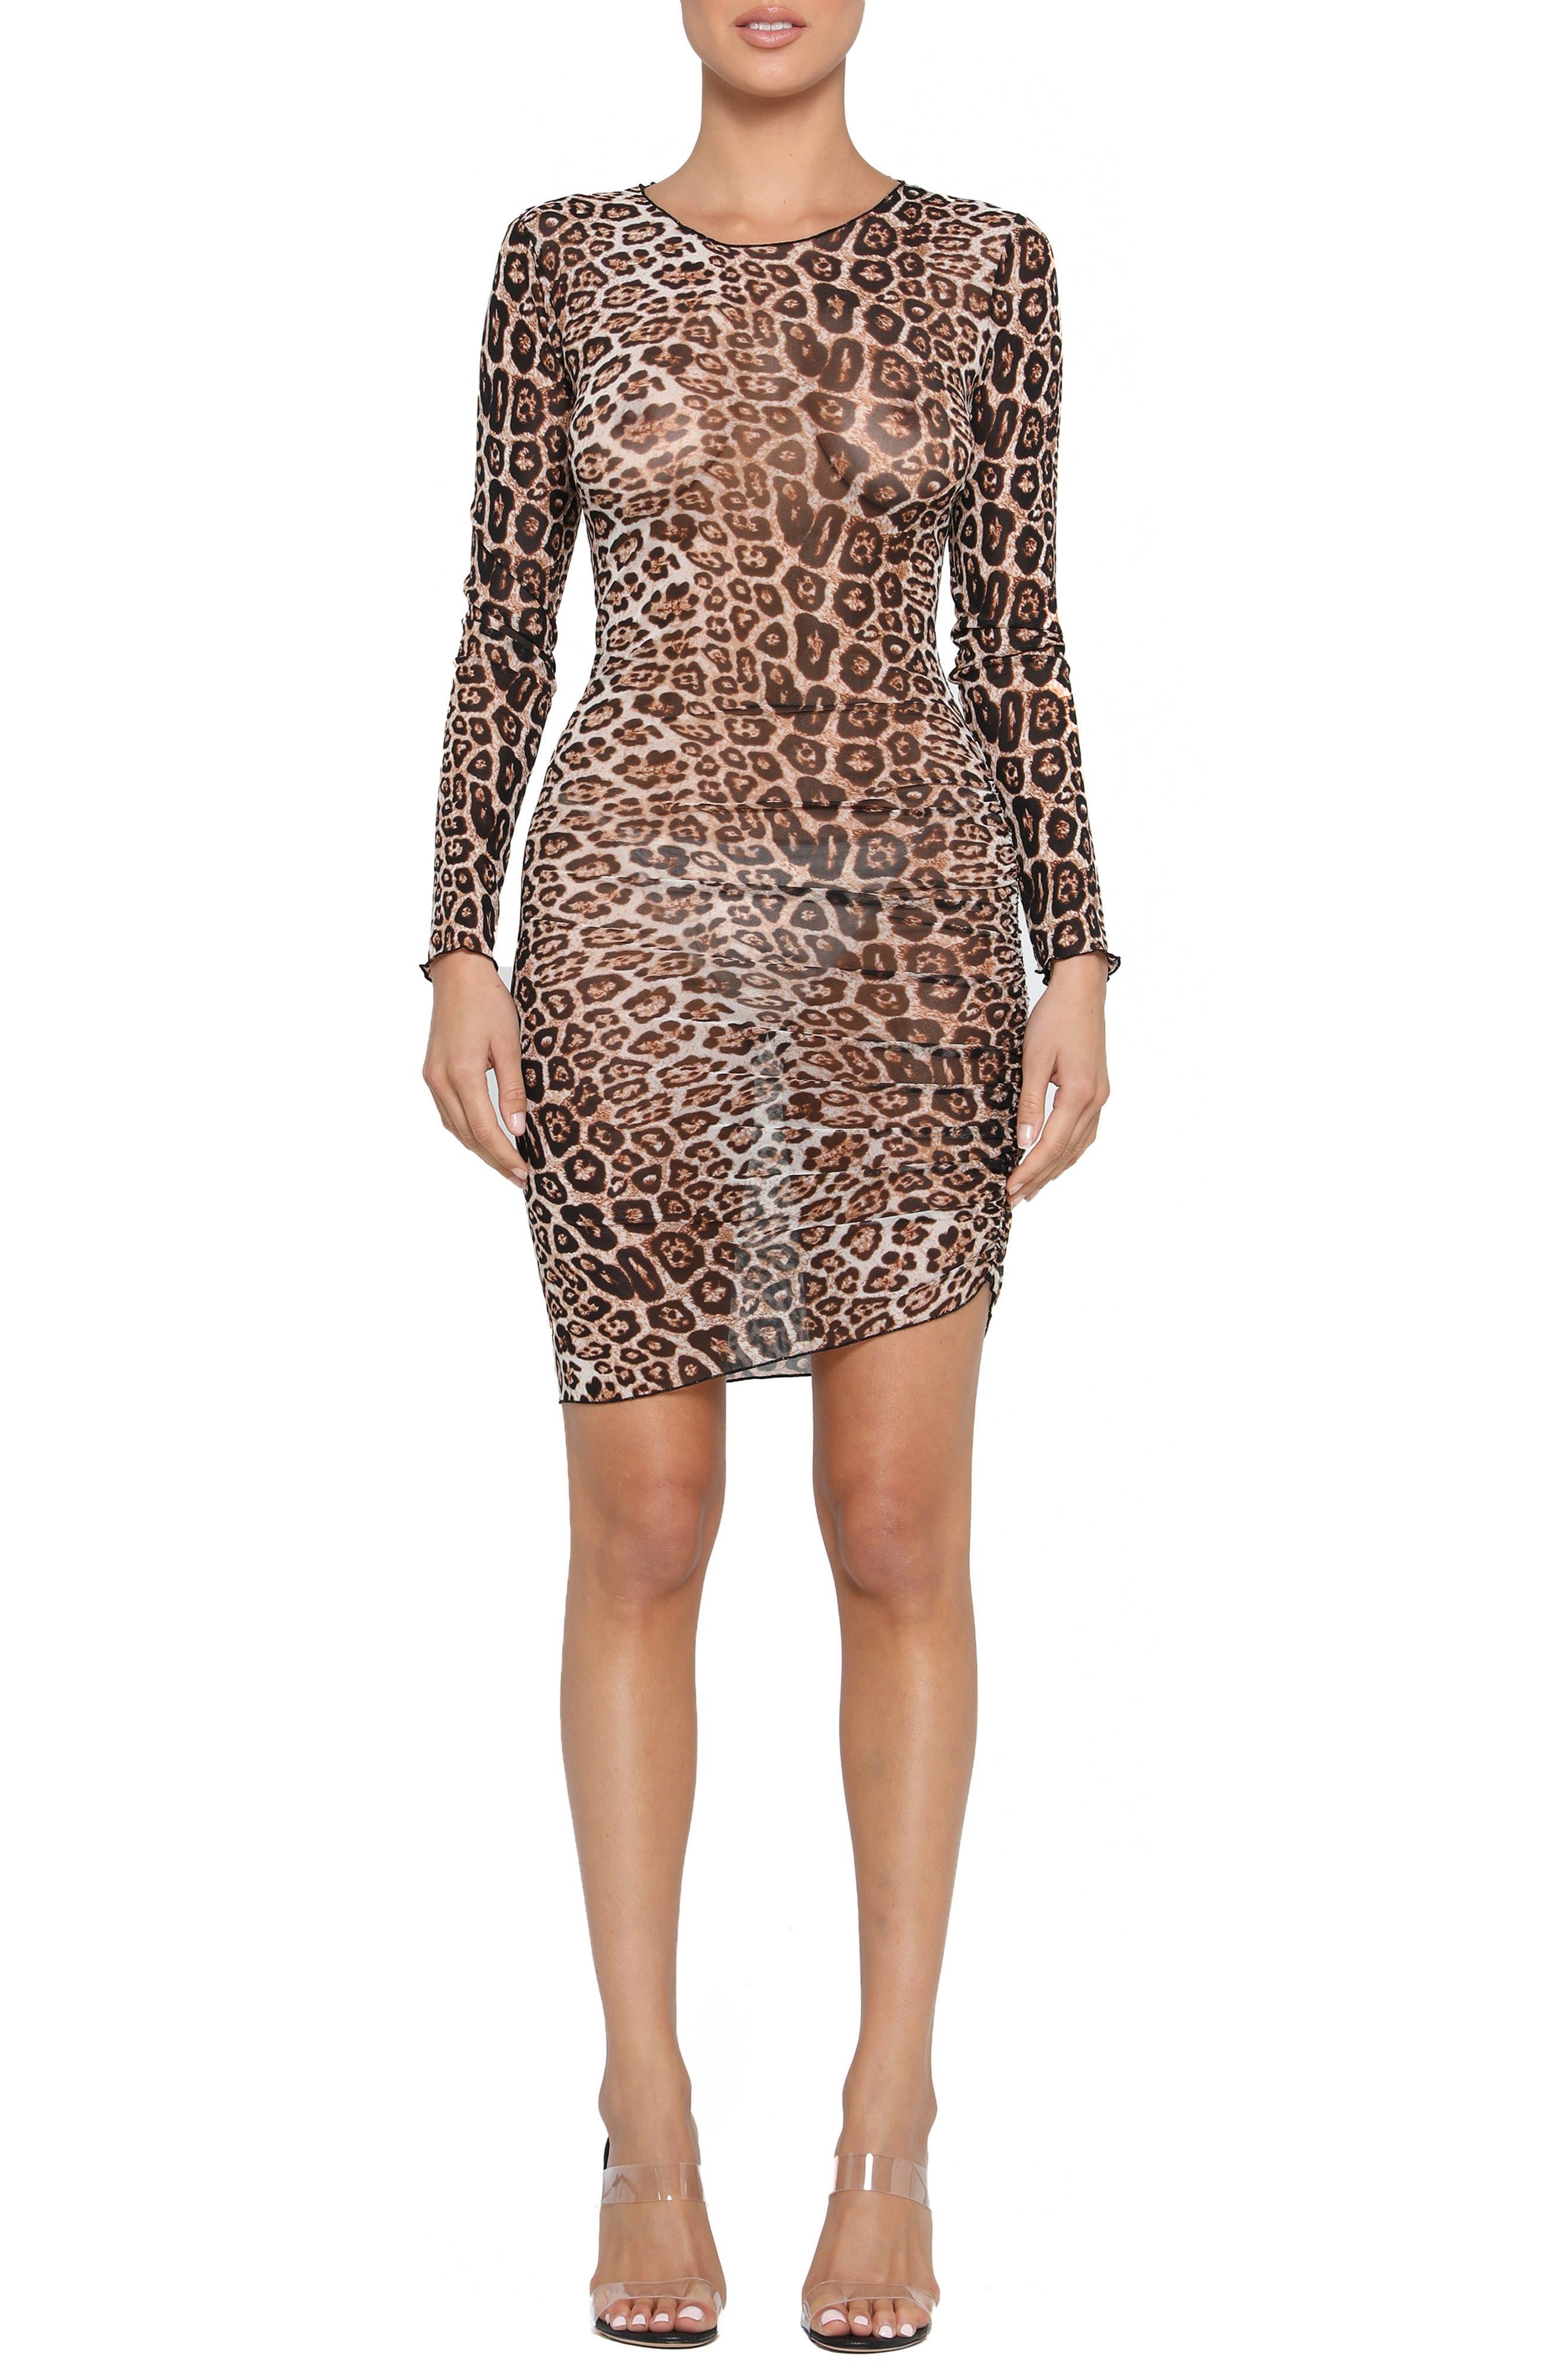 Tiger Mist Aarya Sheer Leopard Print Long Sleeve Body-Con Dress, Brown